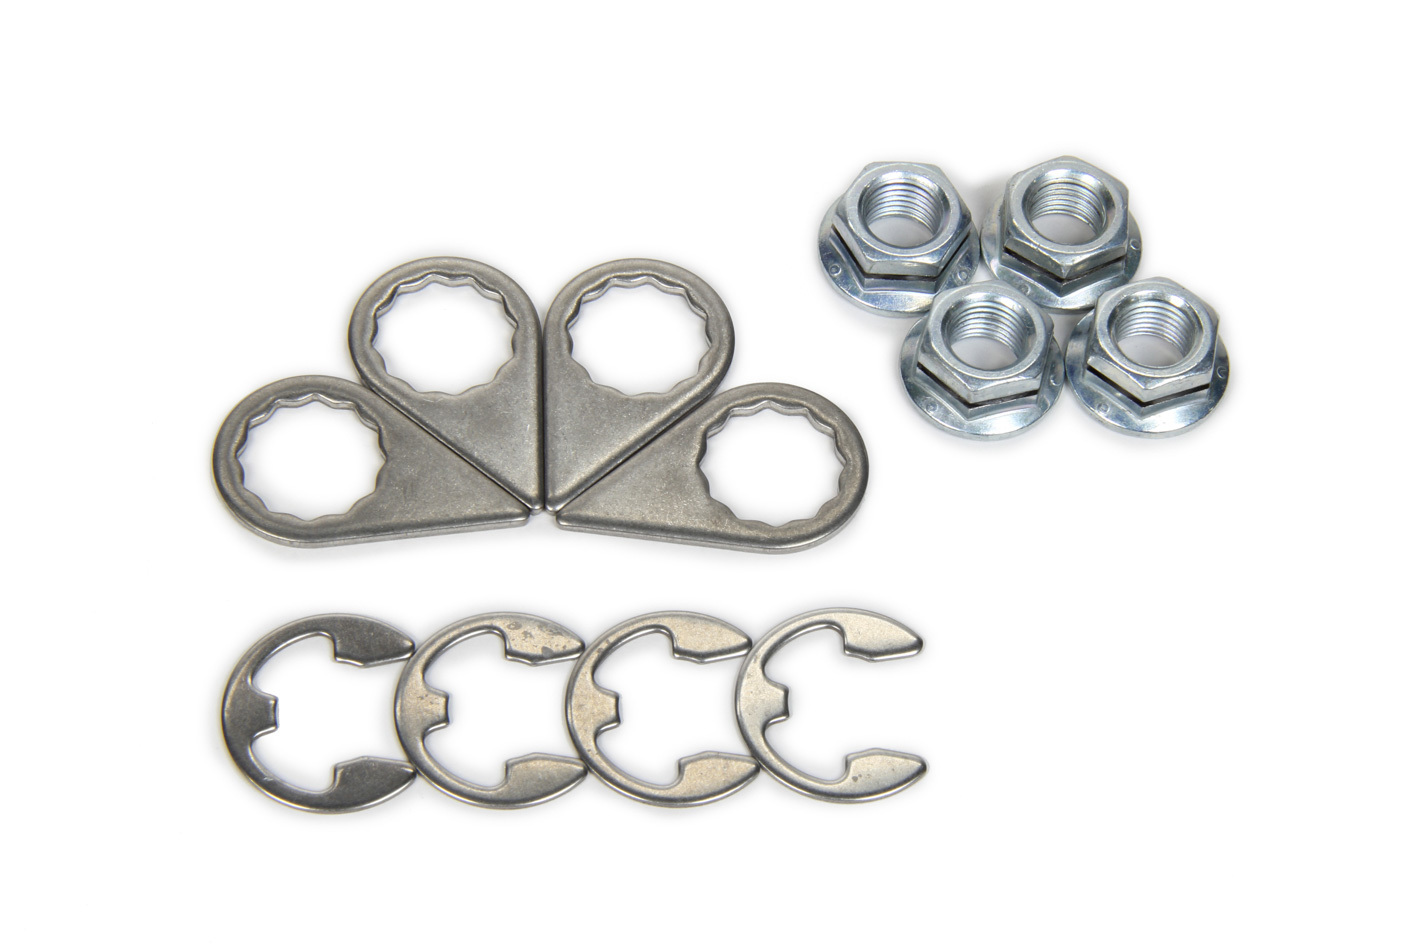 Stage 8 Fasteners Turbo Locking Nut Kit 3/8/2024